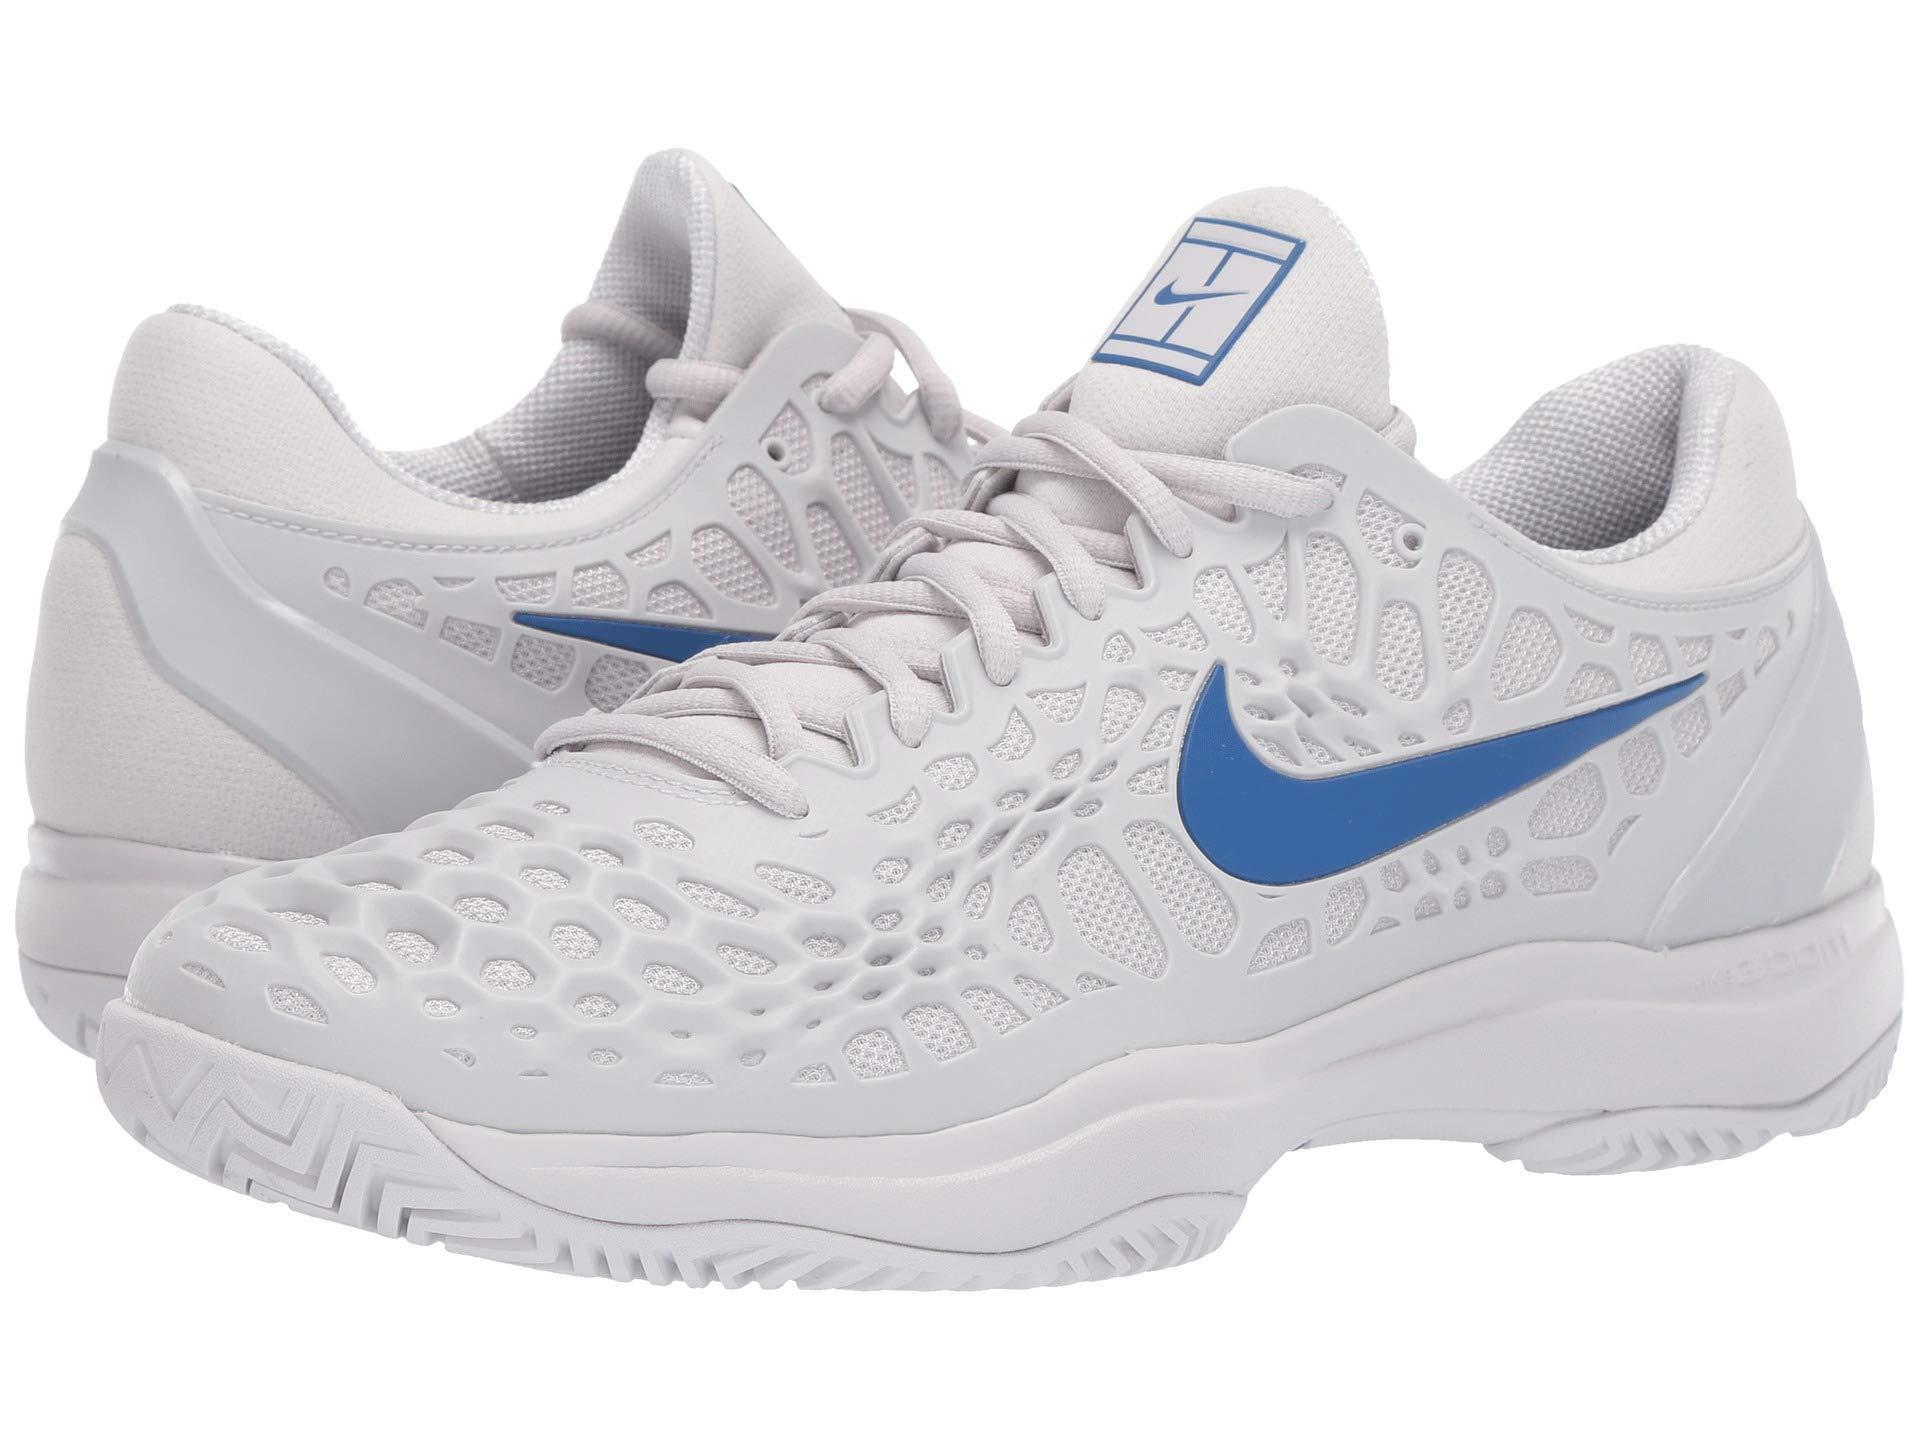 new arrival 2aacf f288b Nike. Blue Zoom Cage 3 Hc (white black bright Crimson) Men s Tennis Shoes